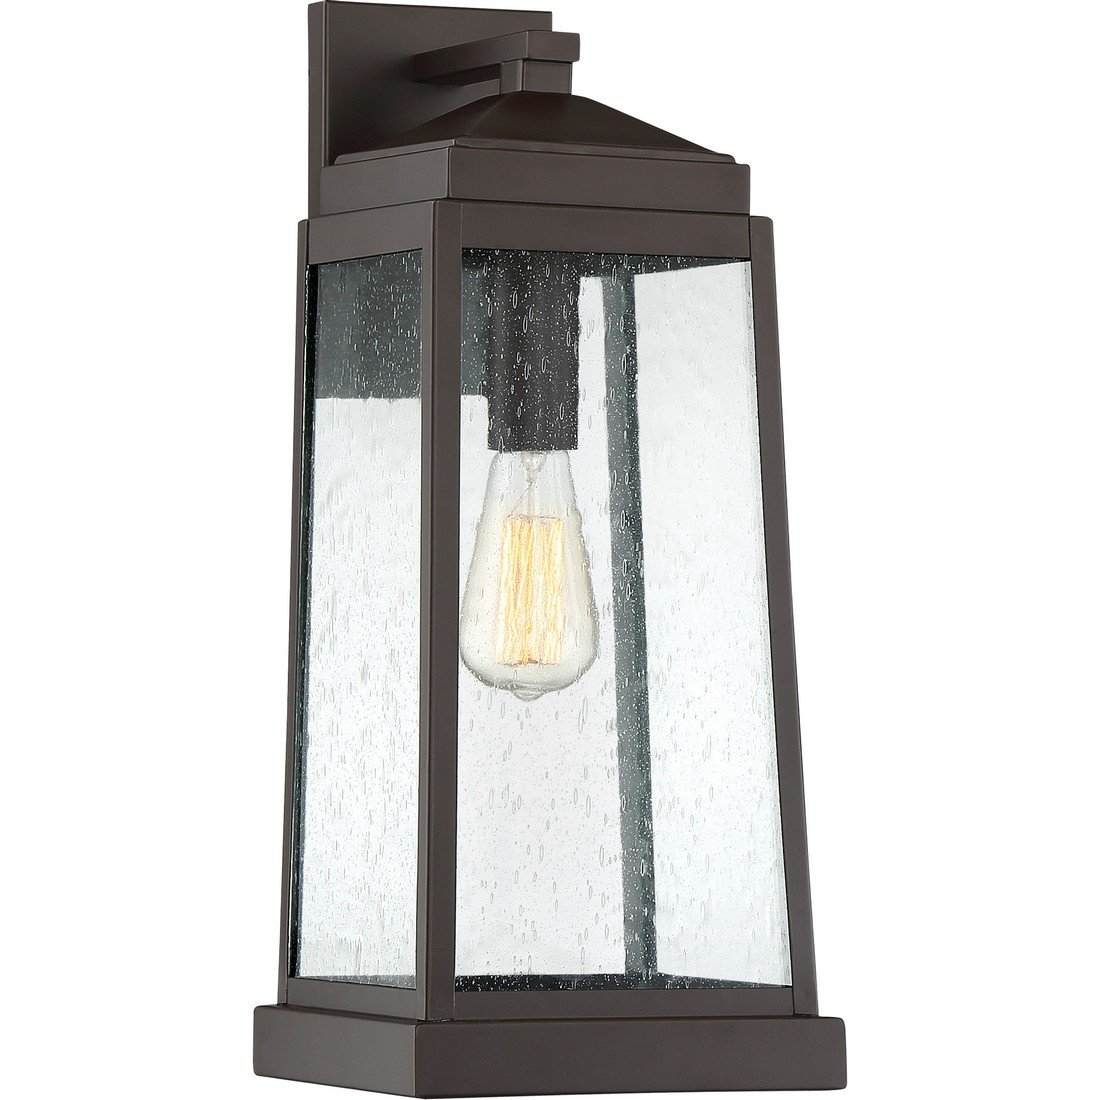 Quoizel RNL8408WT Ravenel Outdoor Lantern